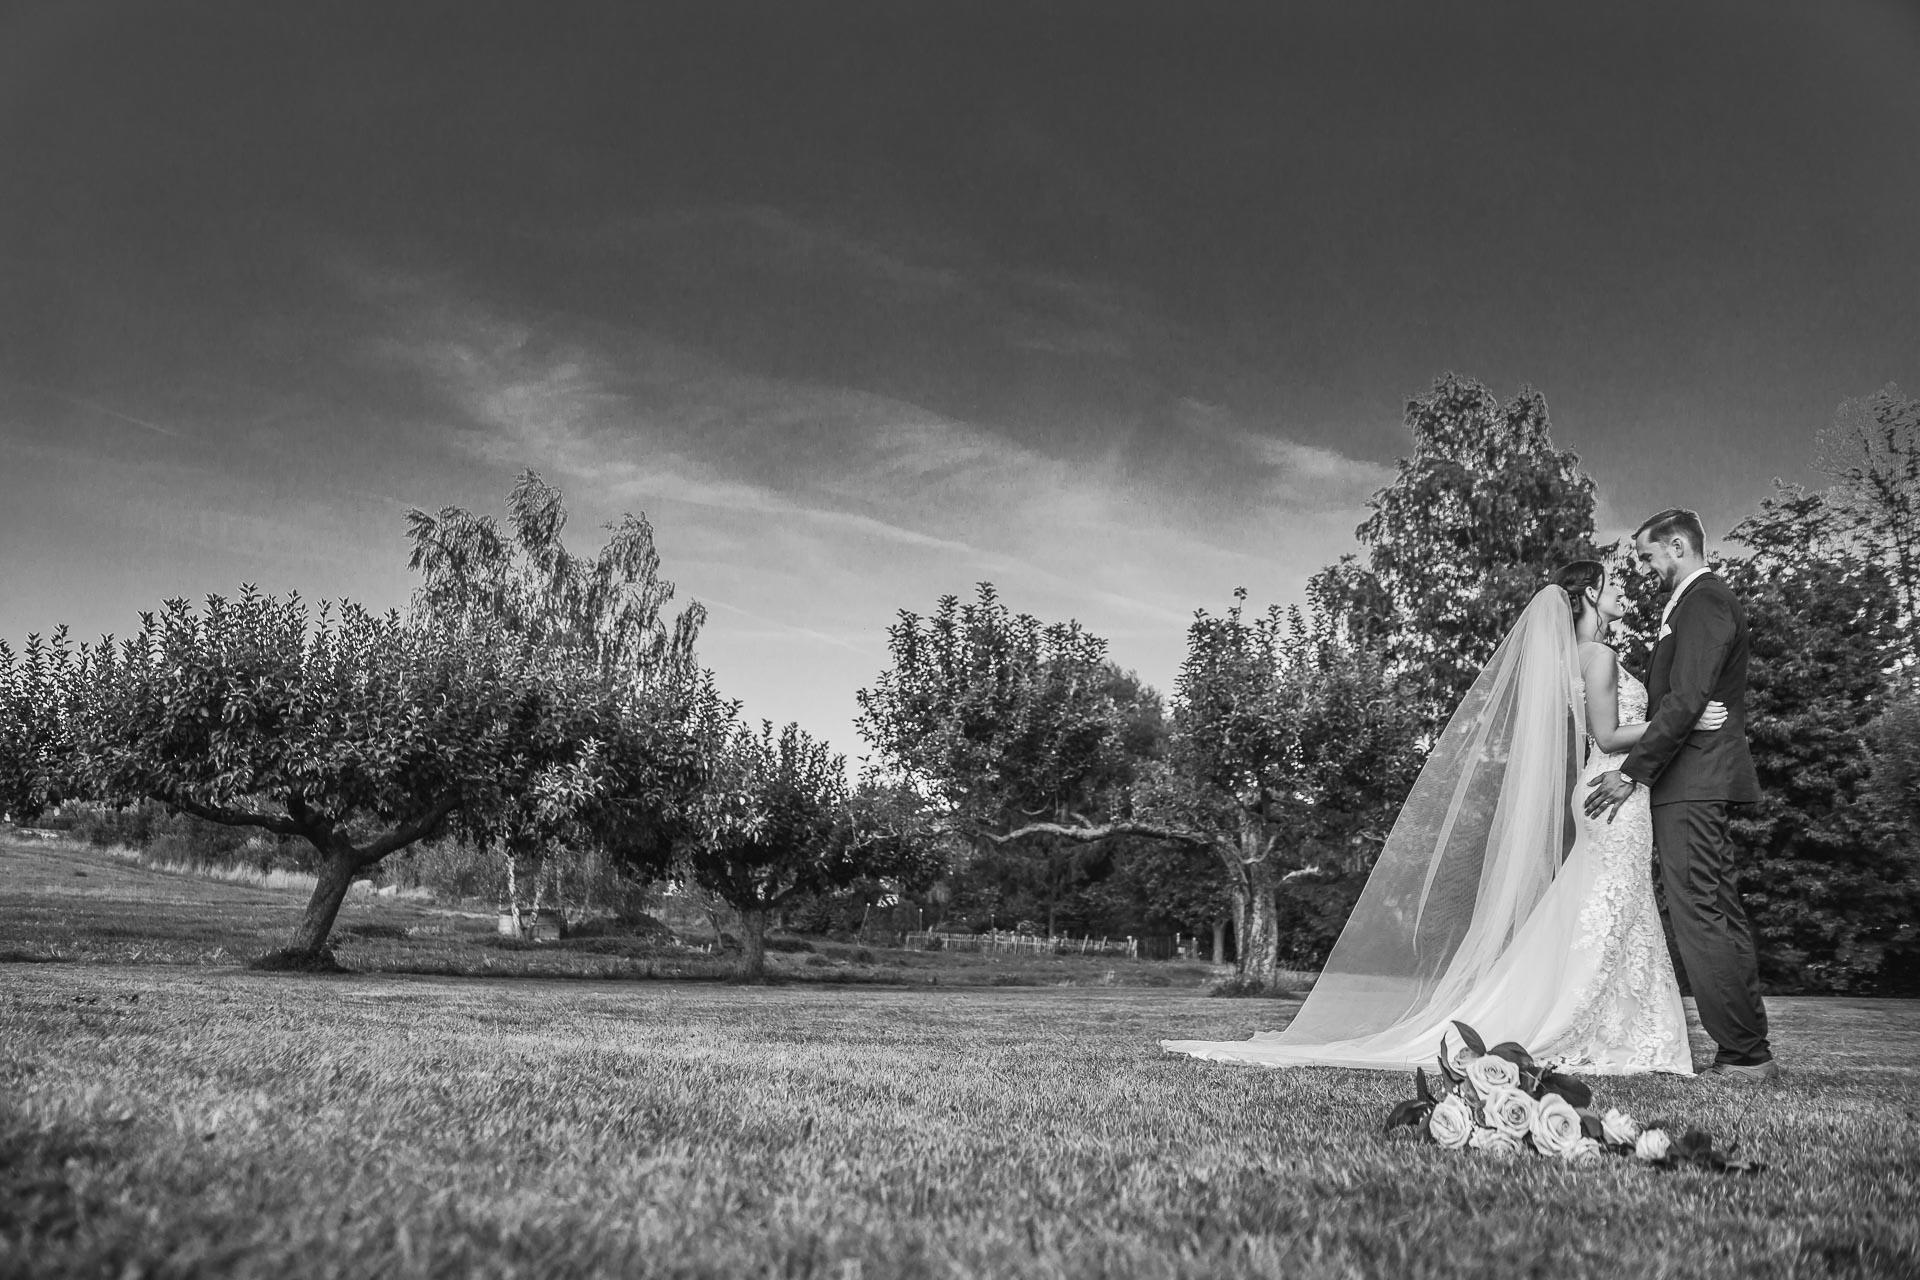 svatební-fotograf-wedding-svatebni-video-orlík-vltava-kostel-statek-stodola-boho-svatba-Beautyfoto-514